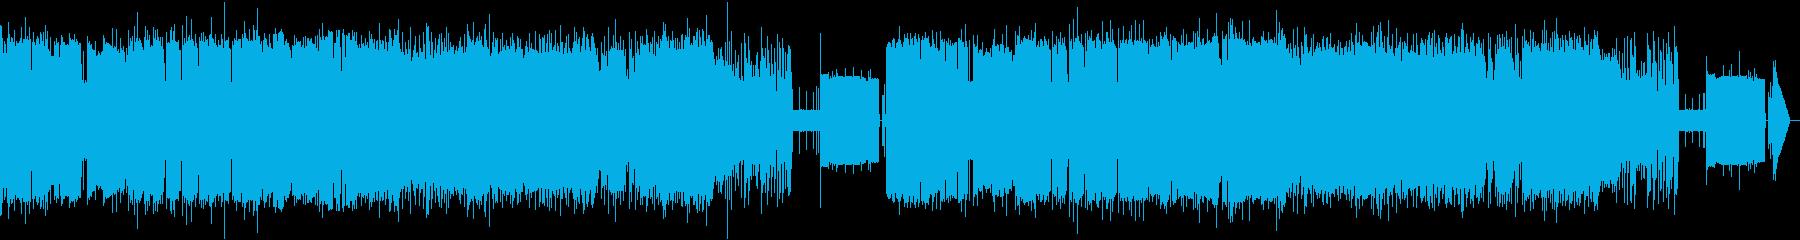 【8bit】白鳥の湖 情景 第2幕10番の再生済みの波形